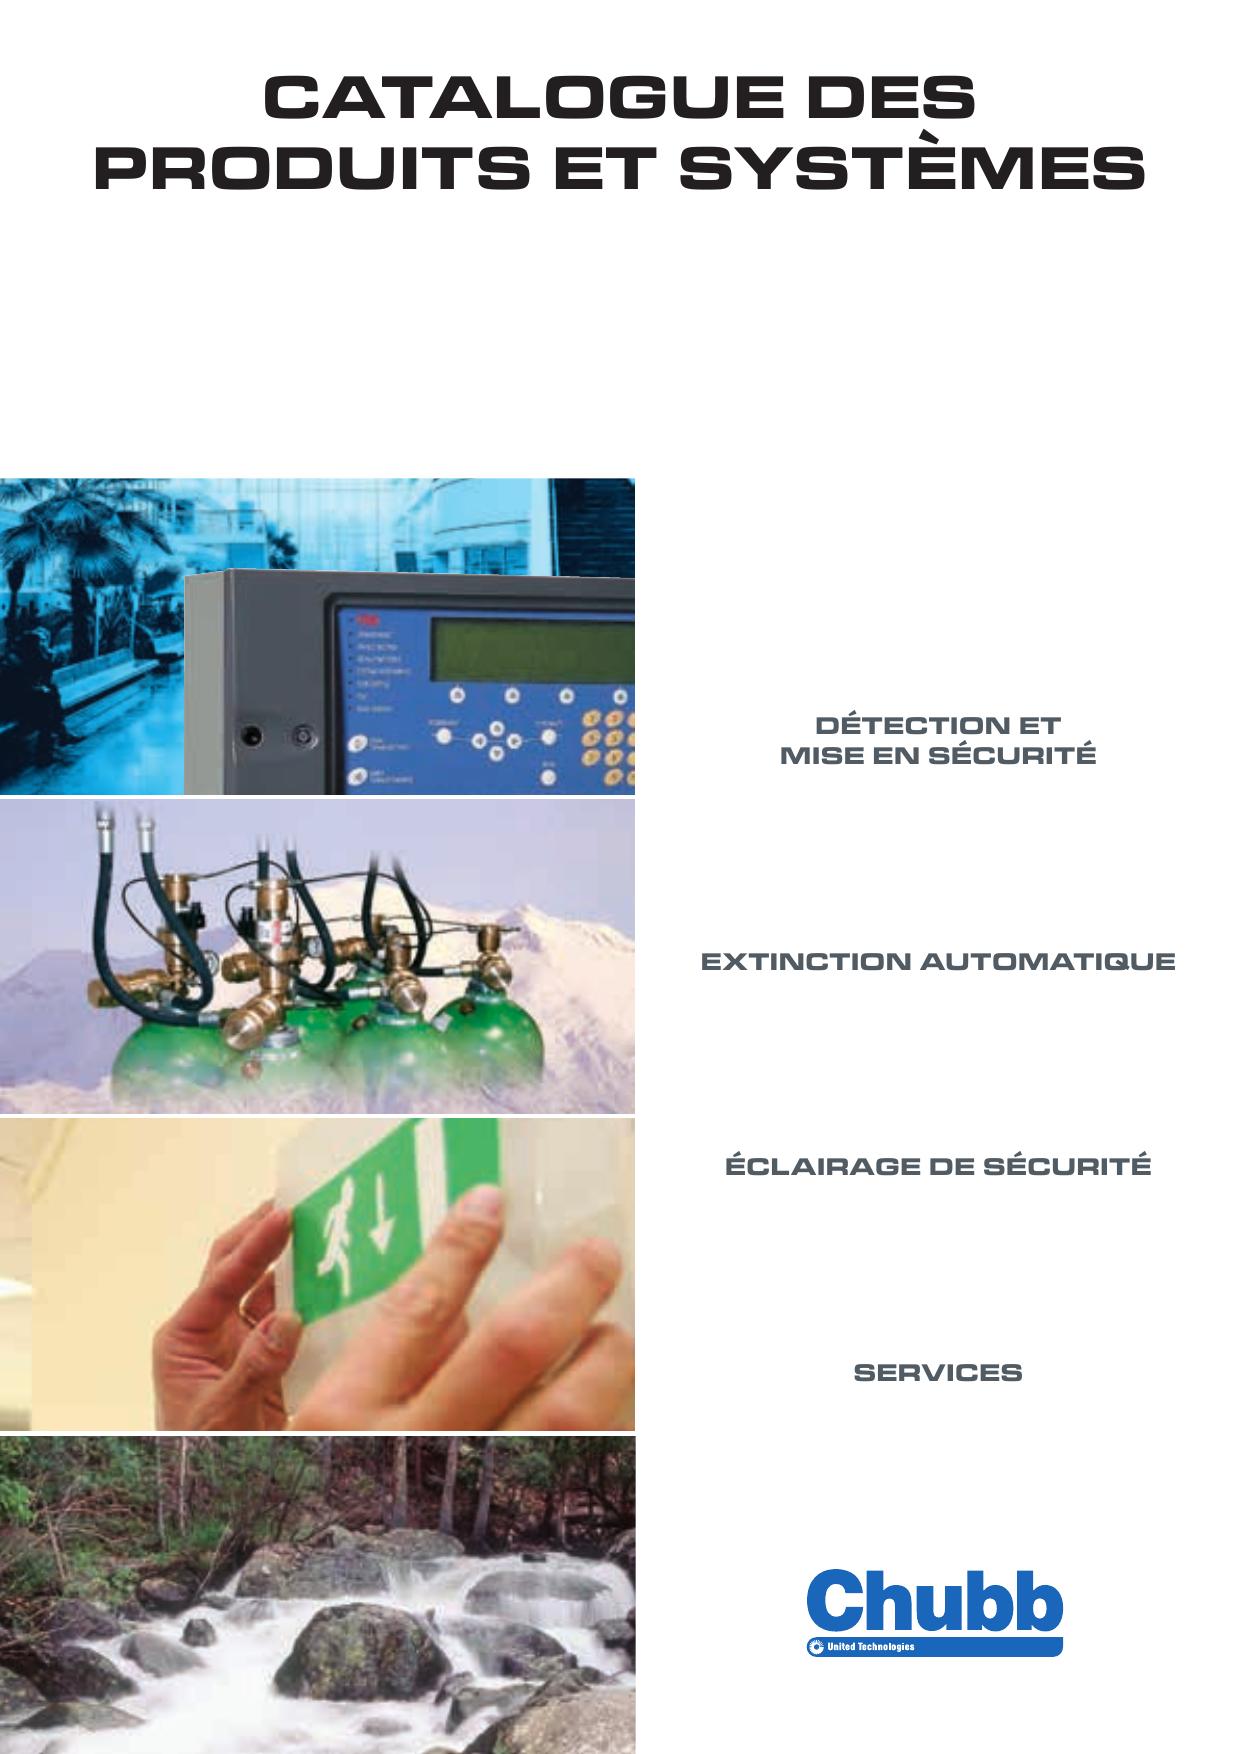 SON/'ECLA BAAS Sa NFS V Chubb système d/'alarme sonore et visuel